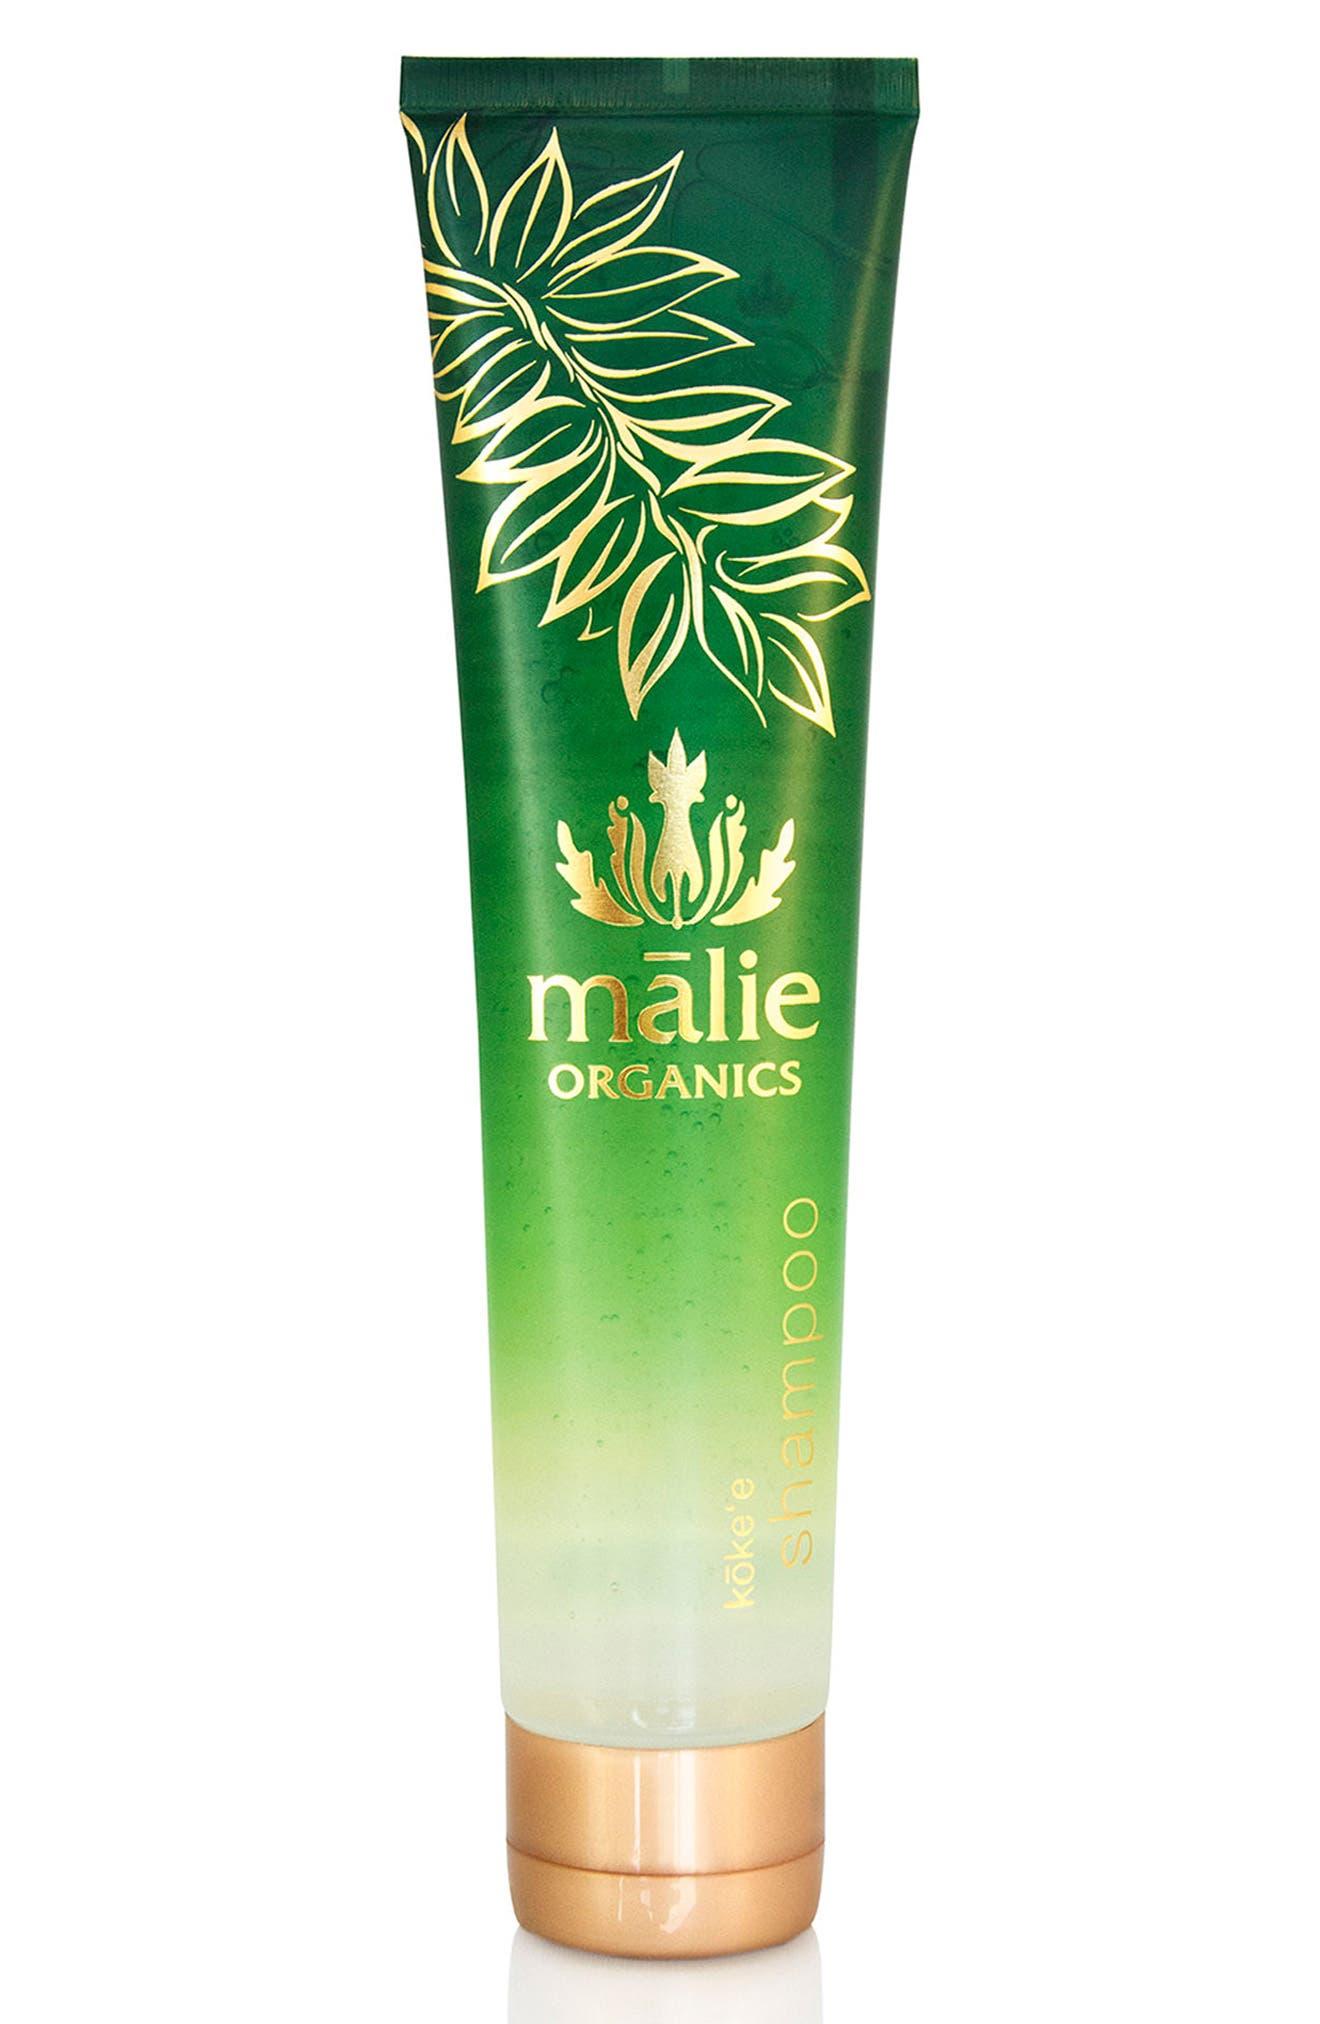 Malie Organics Scented Shampoo